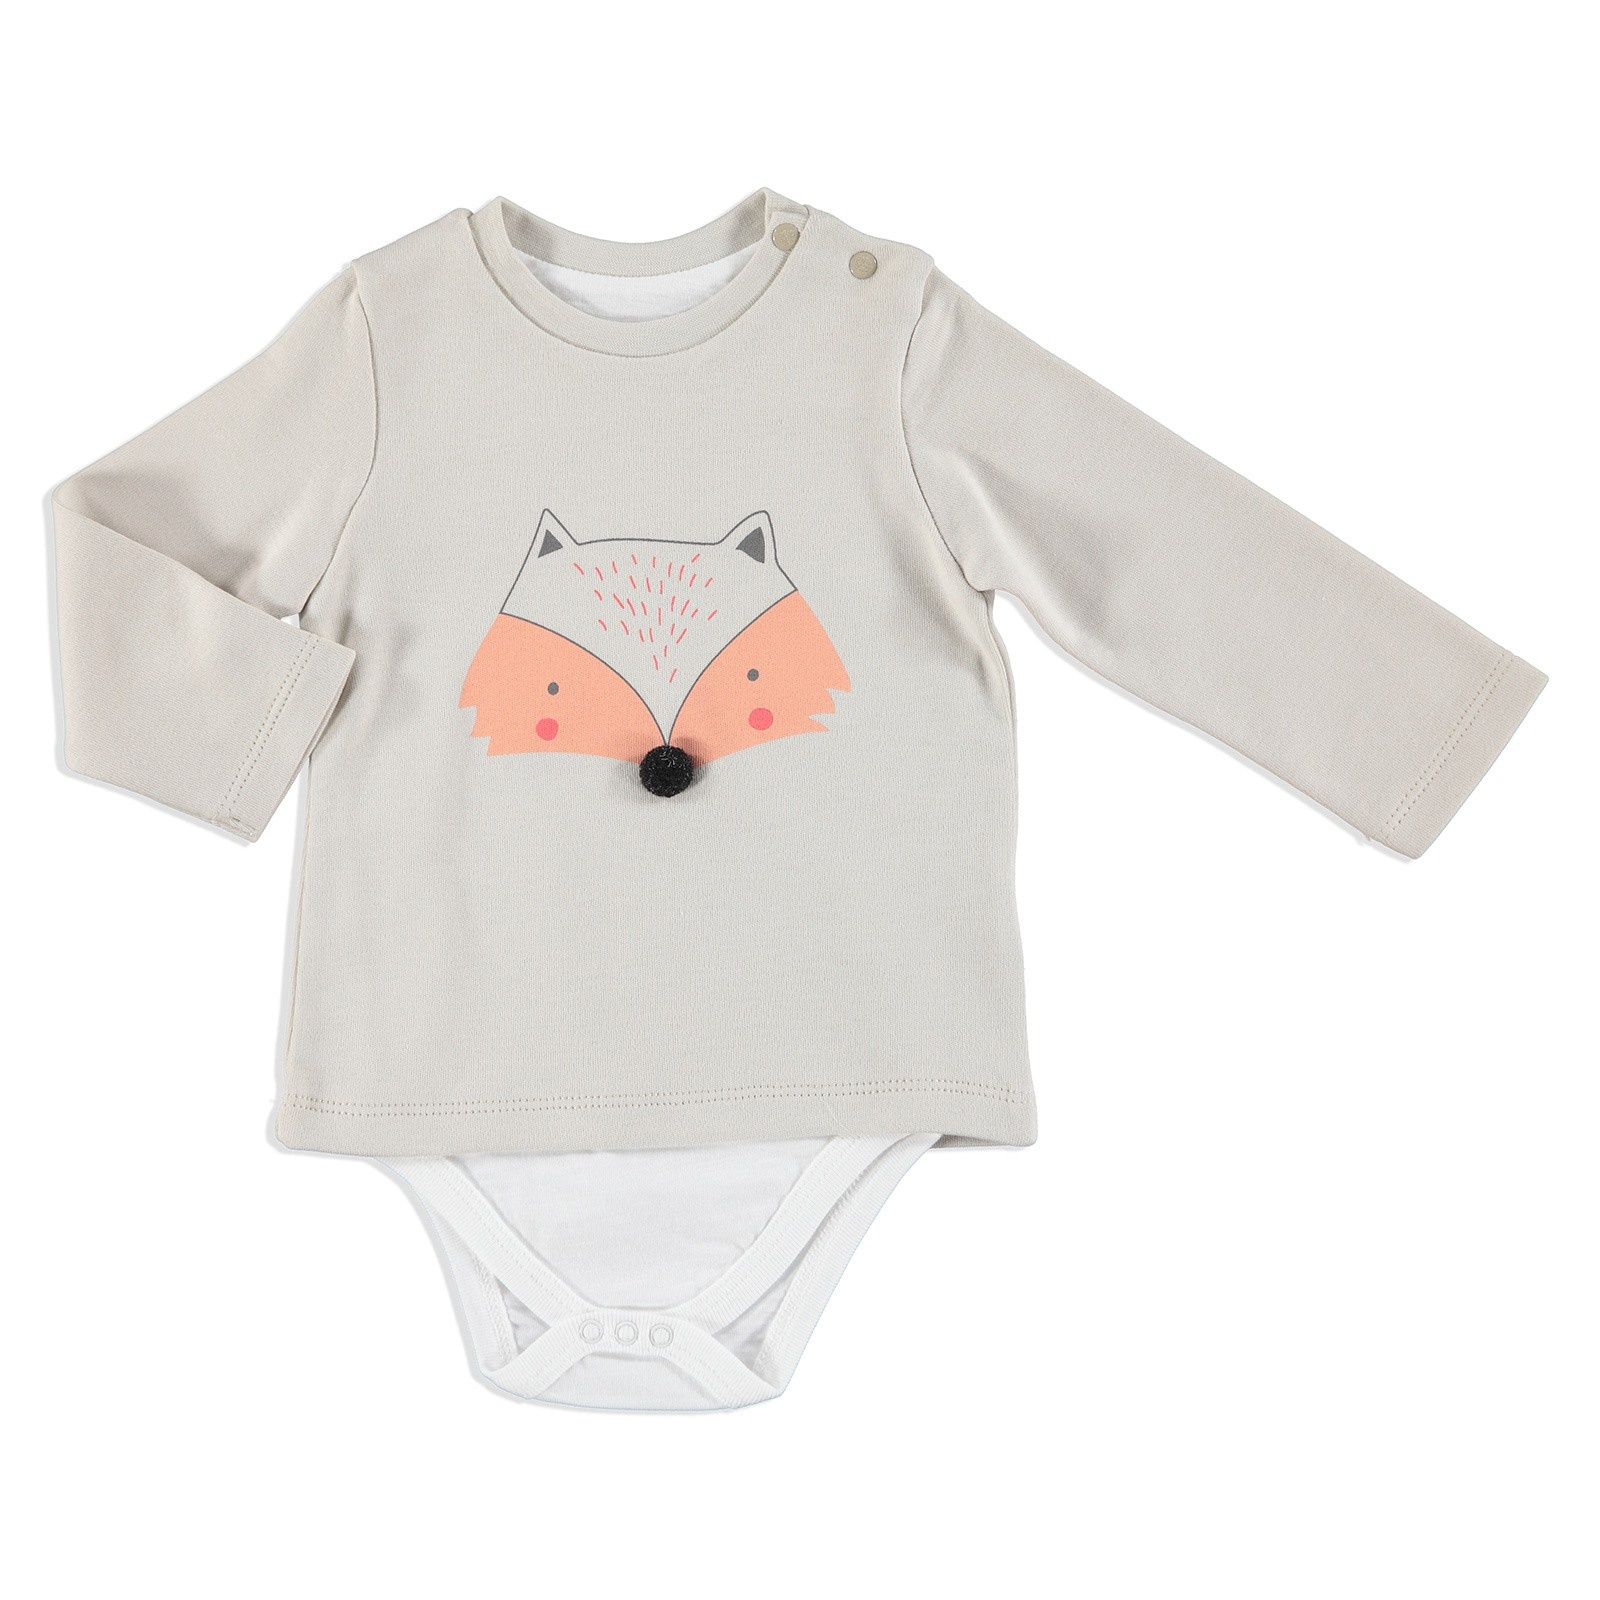 Ebebek HelloBaby Fun Forest Baby Bodysuit